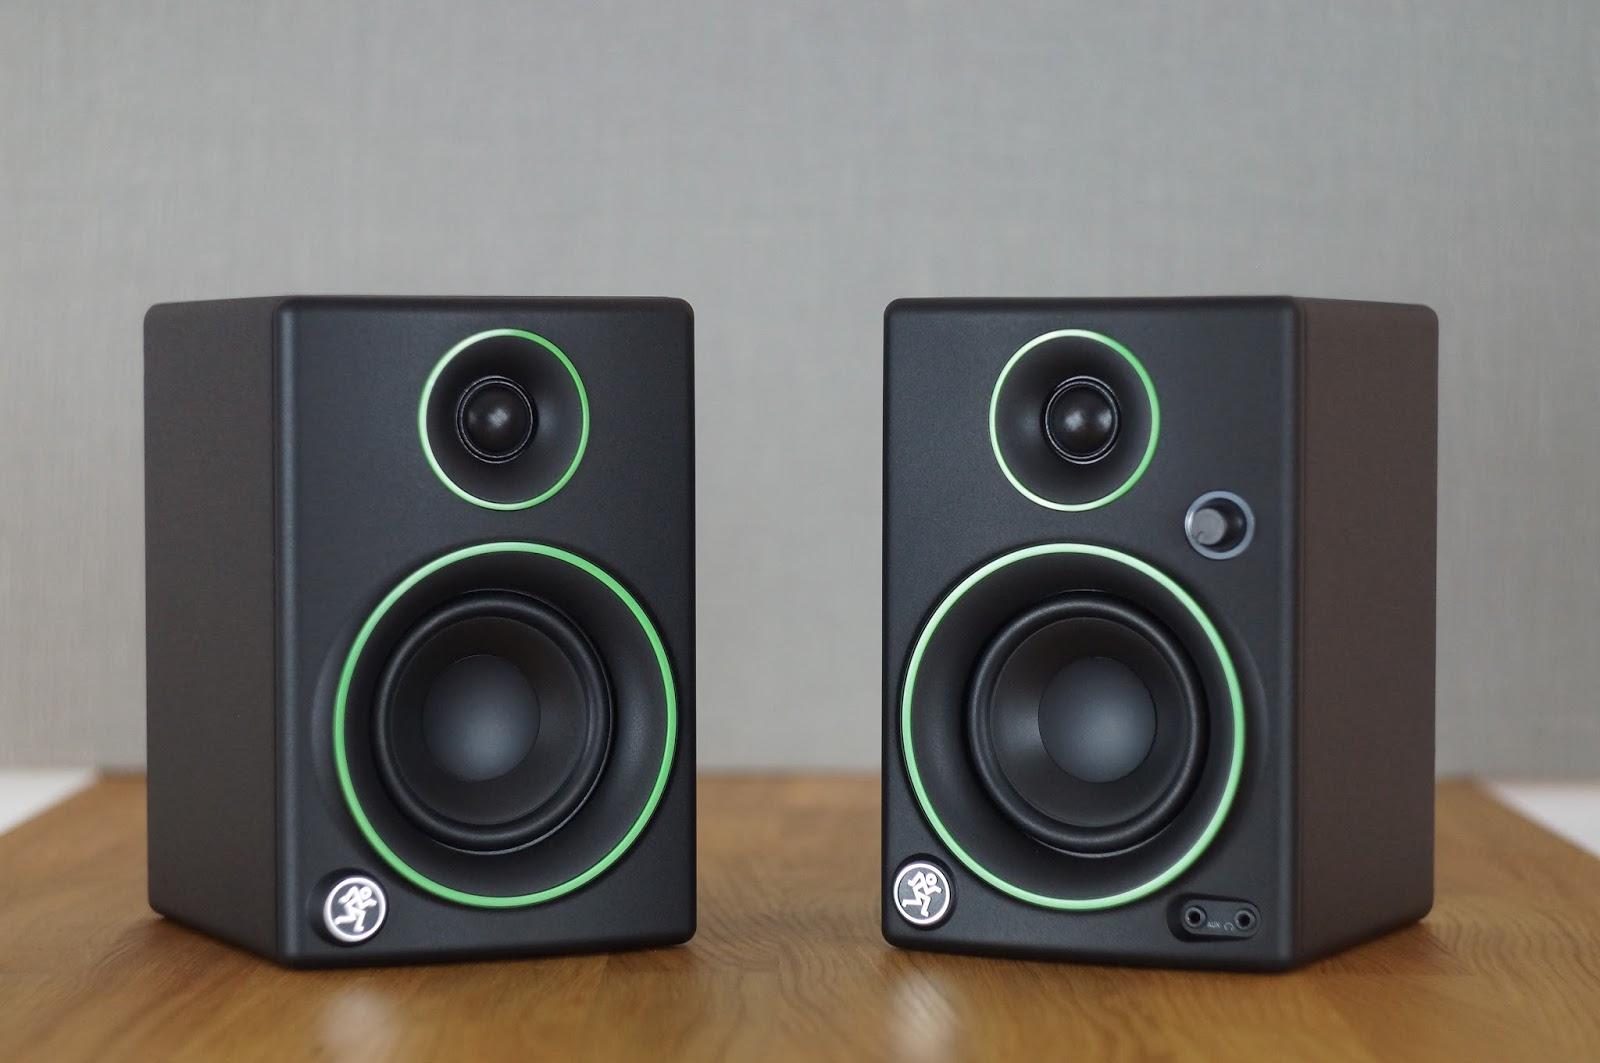 Bose Companion 2 III, Mackie CR3 and Edifier R1280T comparison ...